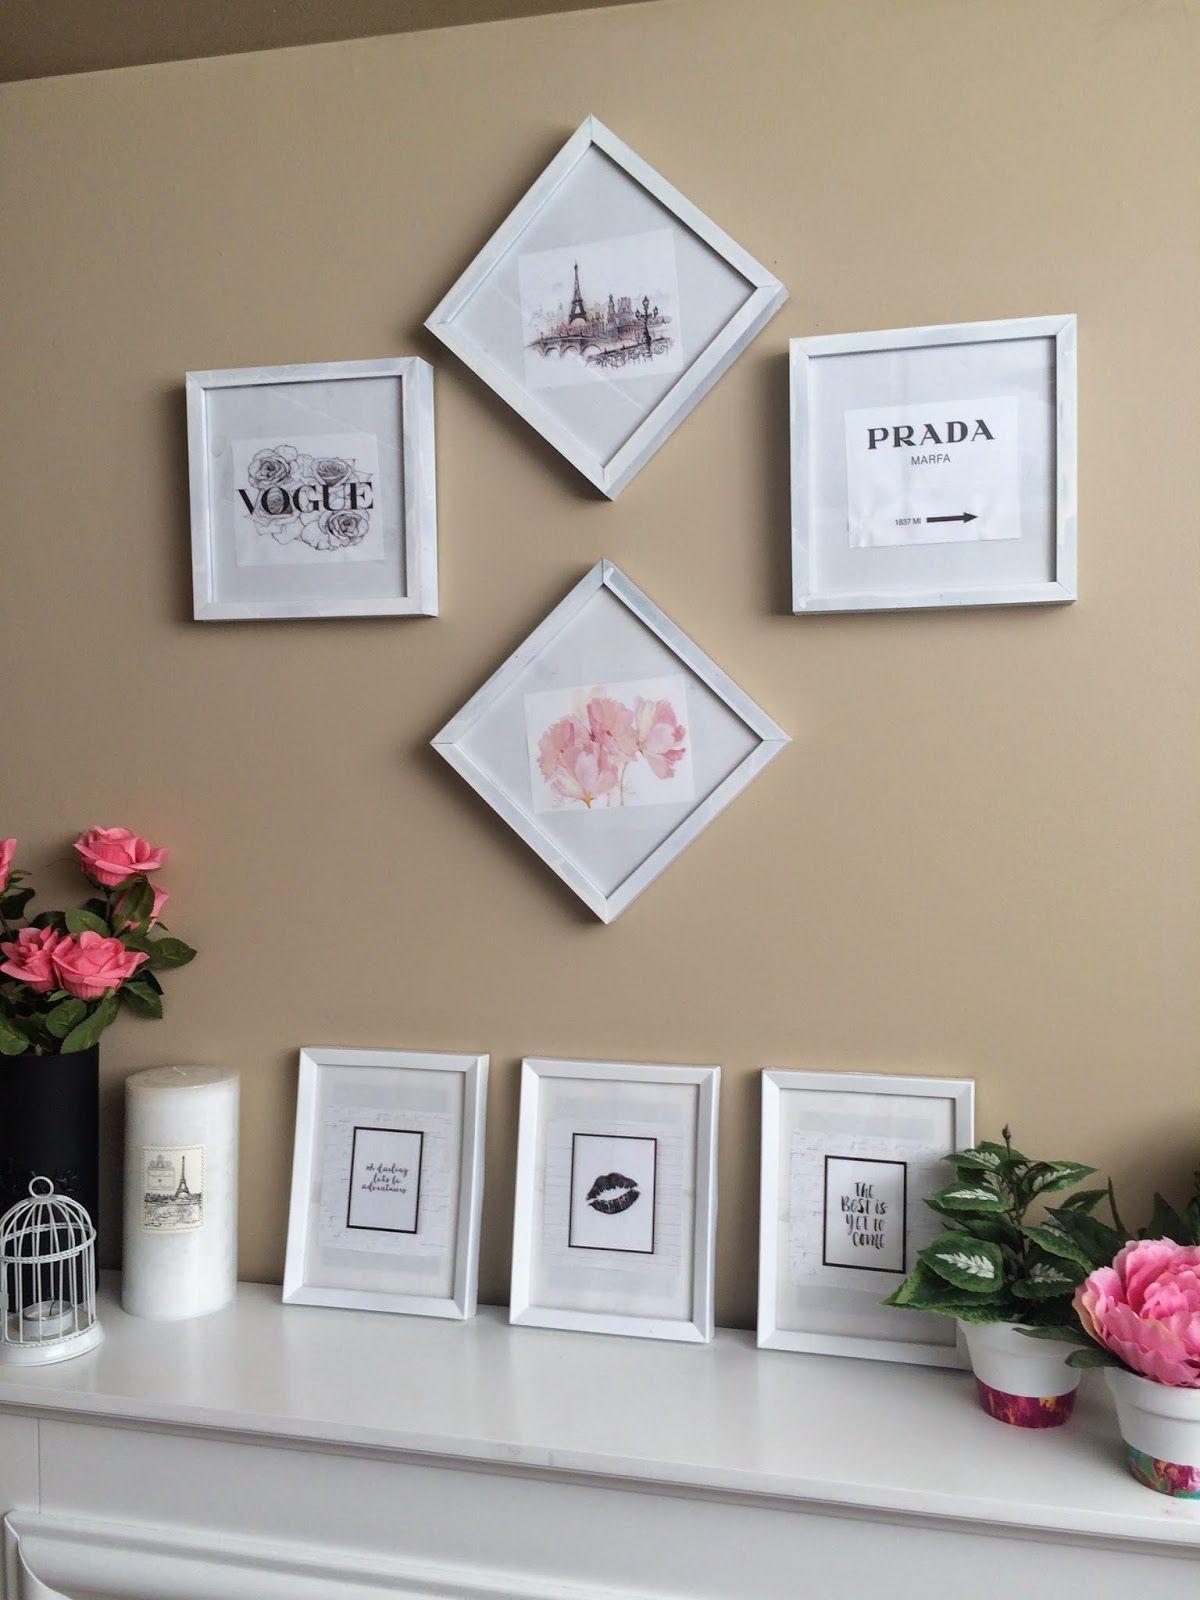 kalyn nicholson | midnightmind: DIY Spring Room Decor